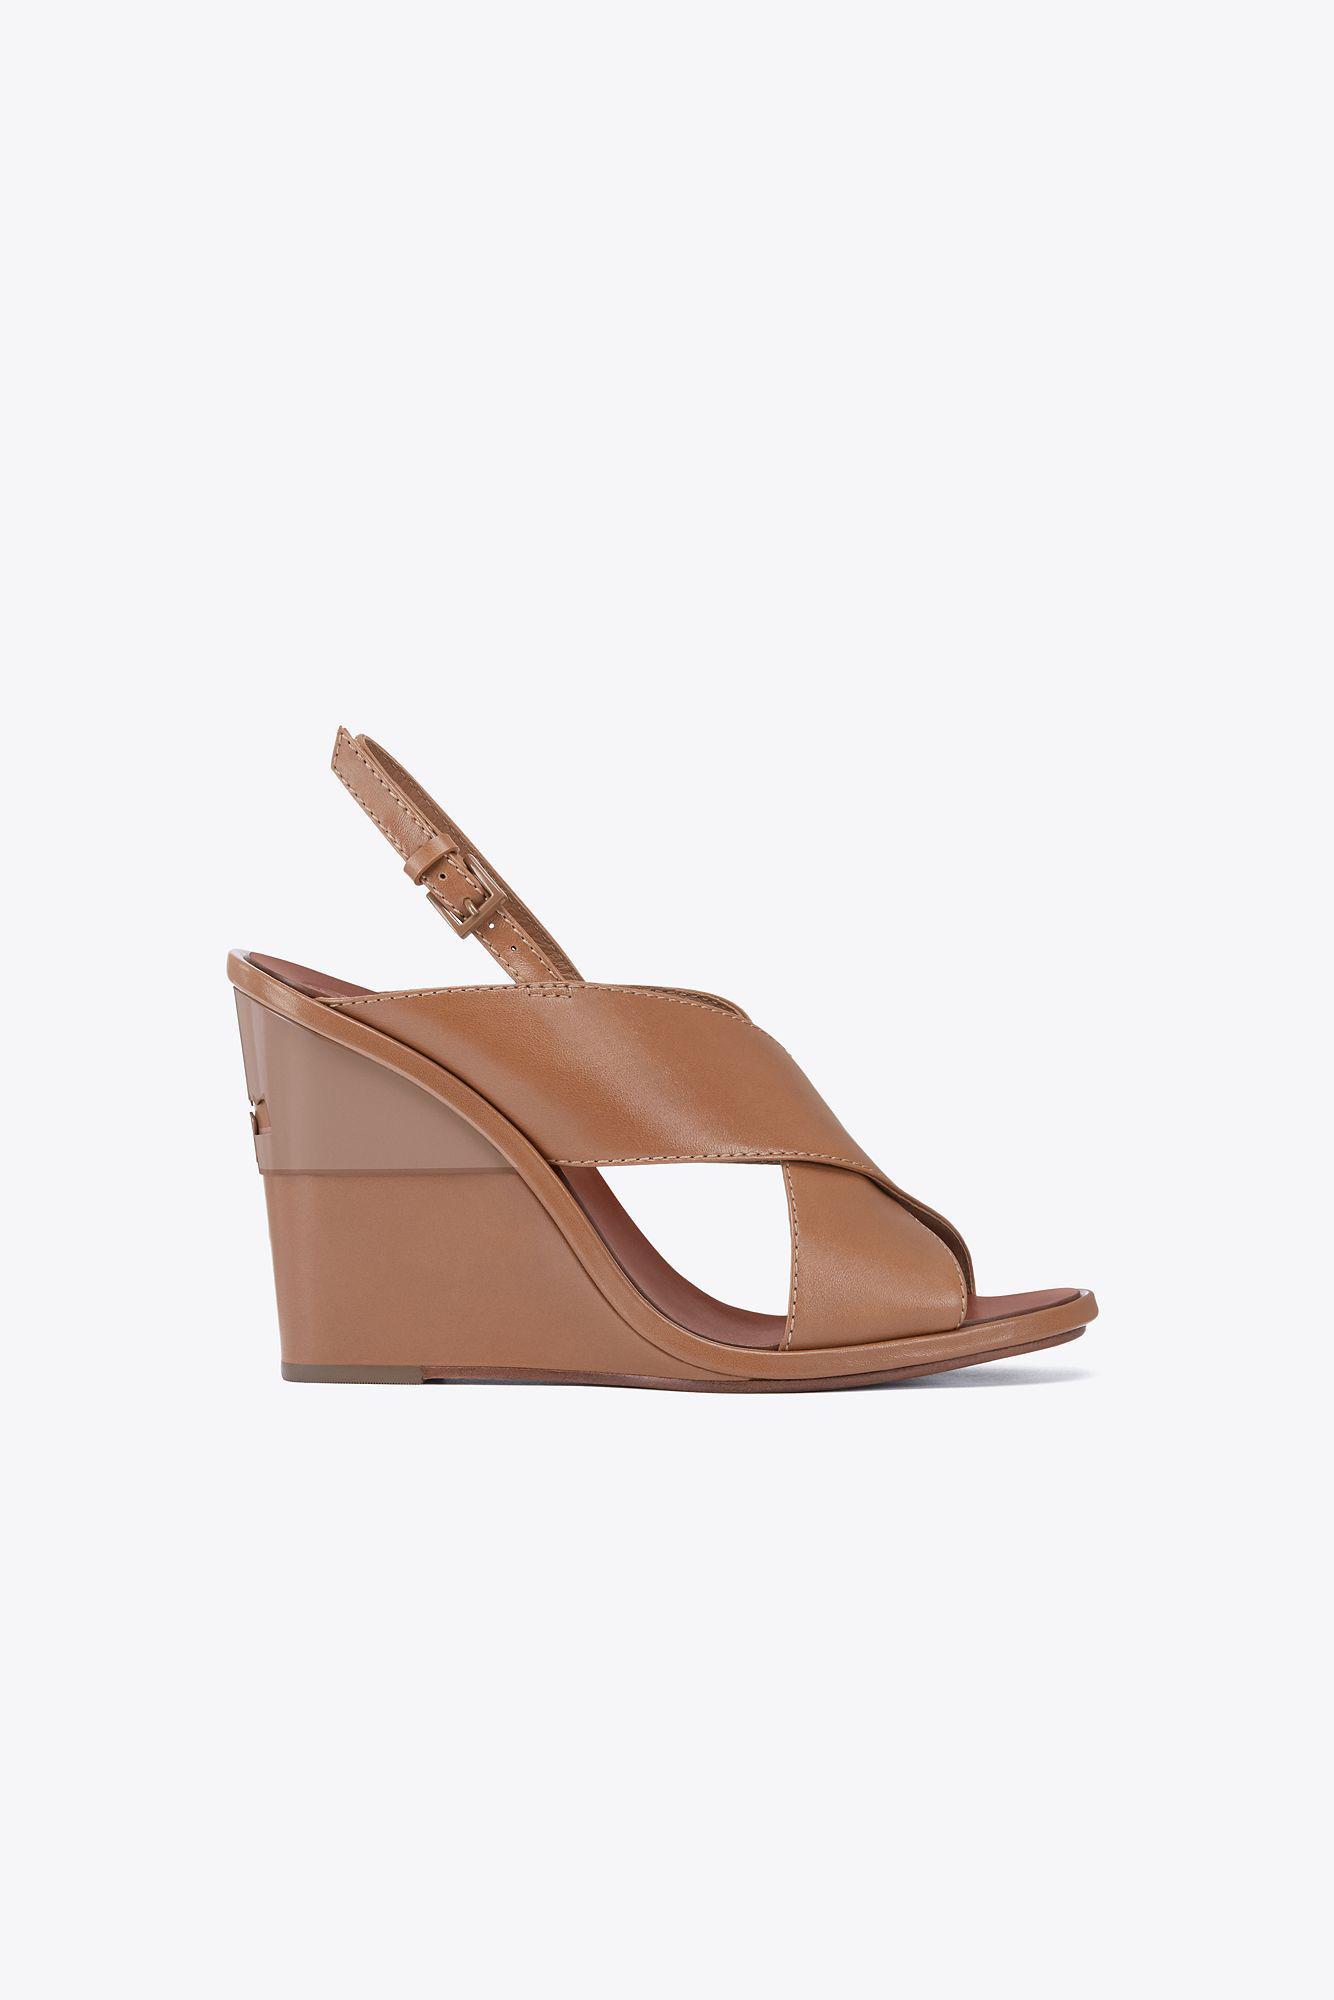 412badb60 Lyst - Tory Burch Gabrielle Wedge Sandal in Brown